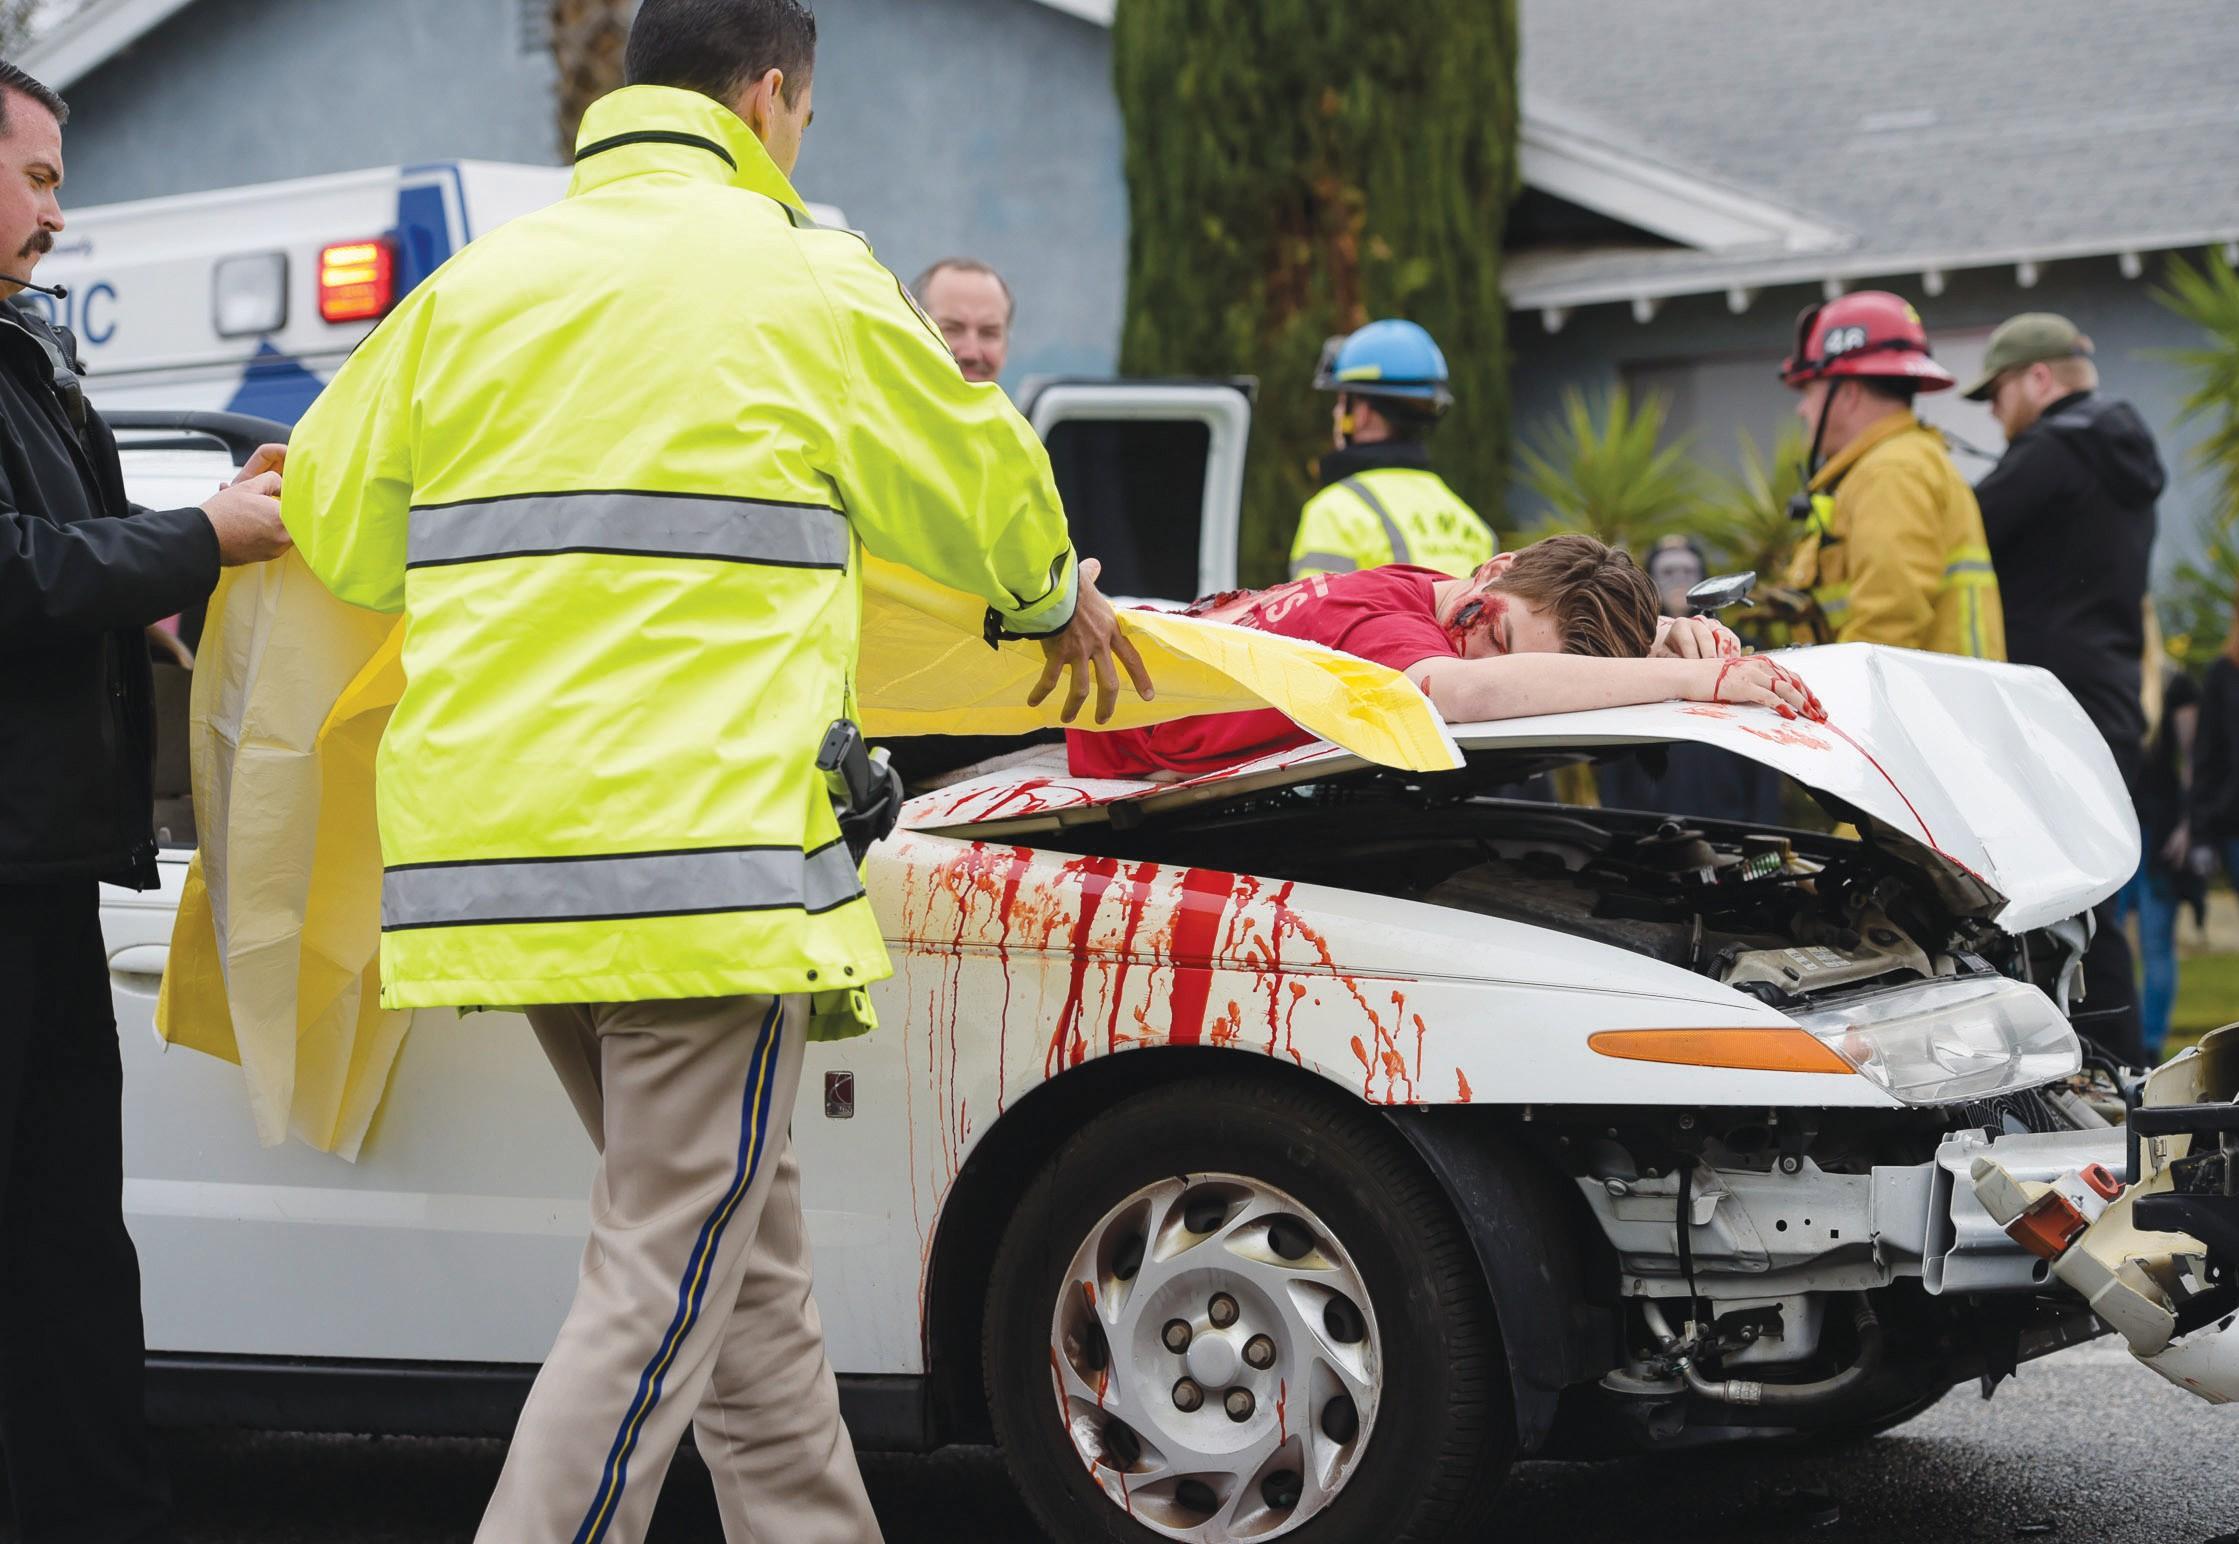 A sobering reenactment | Simi Valley Acorn